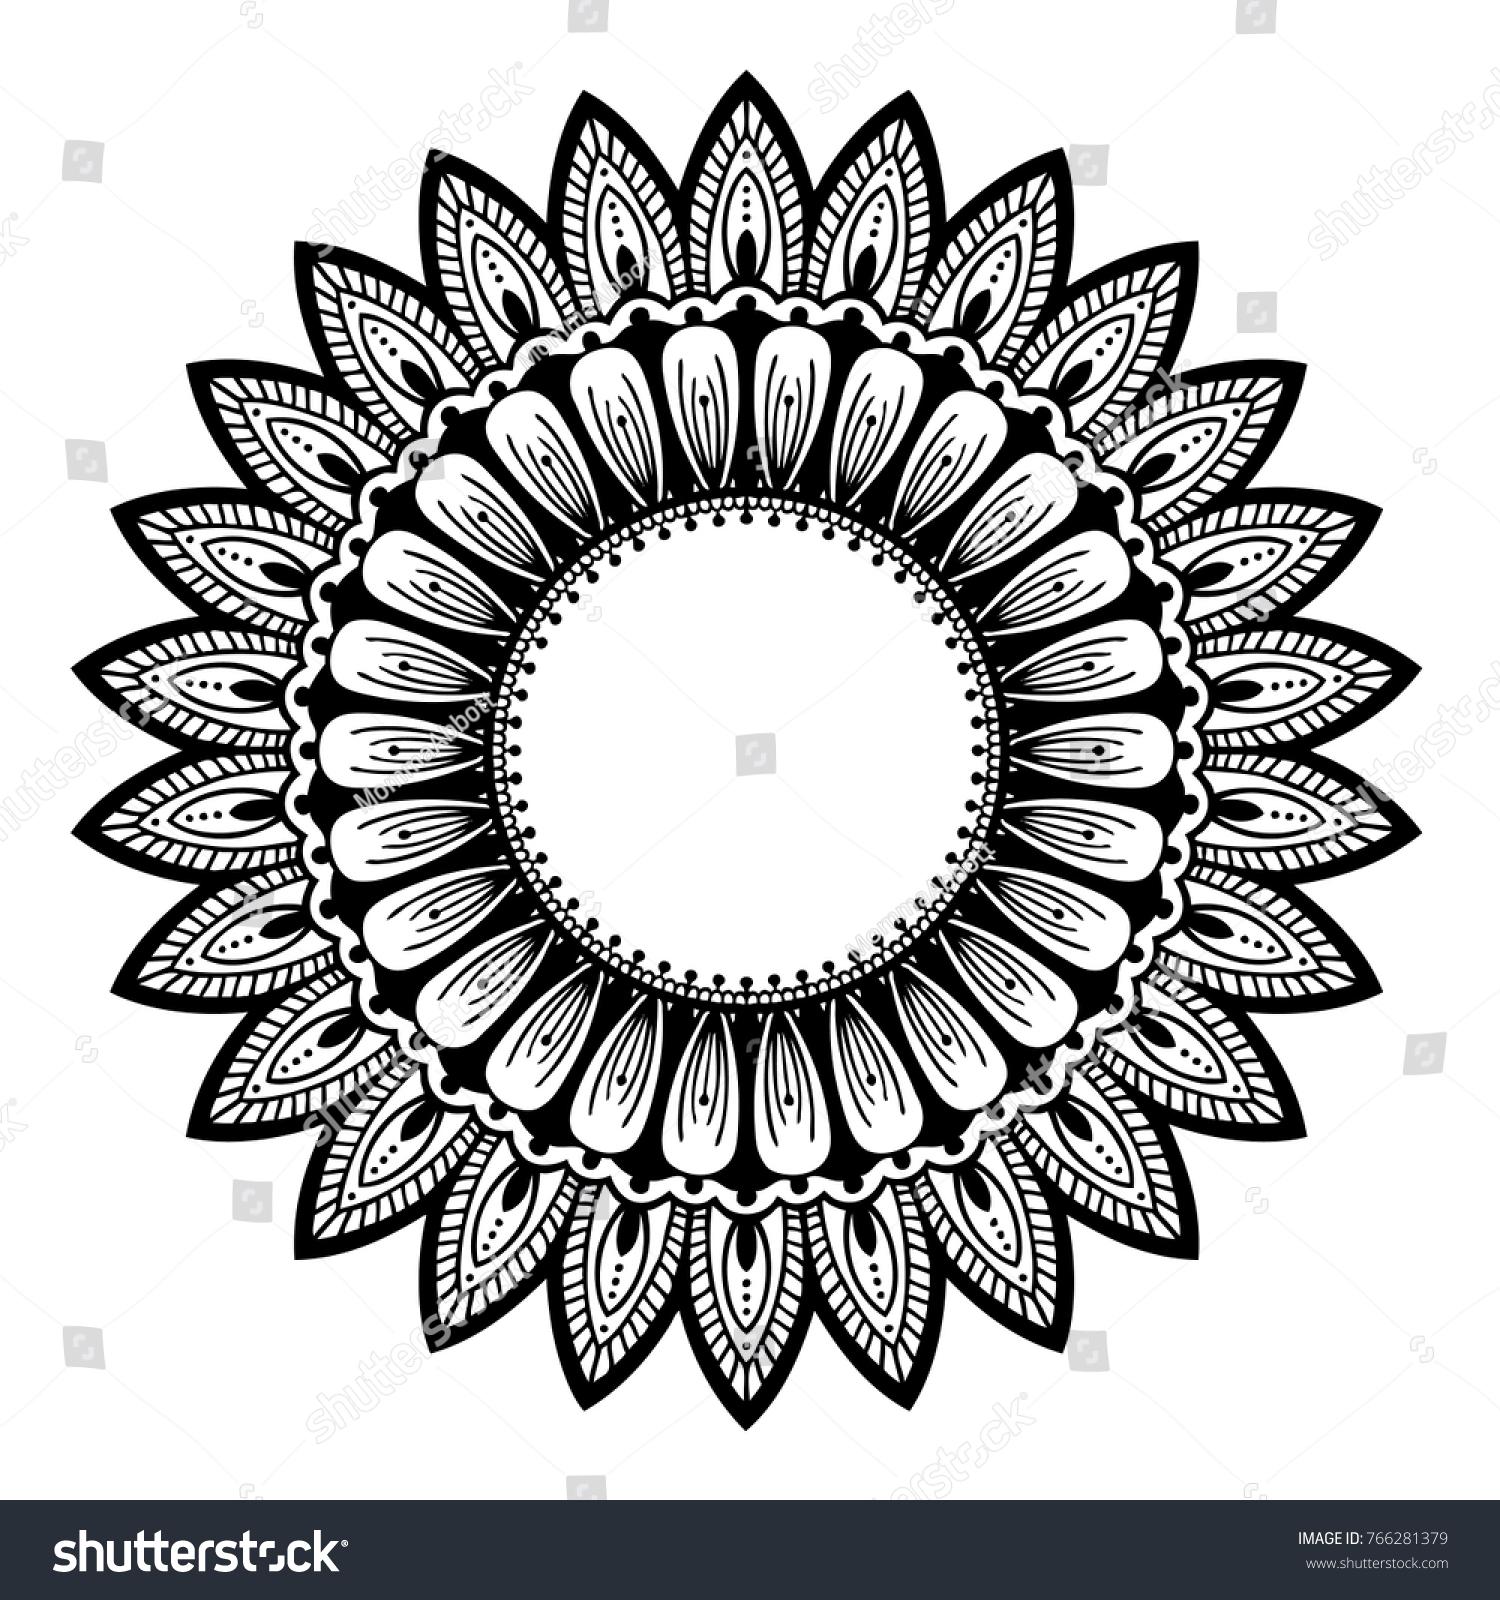 Sunflower Mandala Hand Drawn Vector Illustration Coloring Page